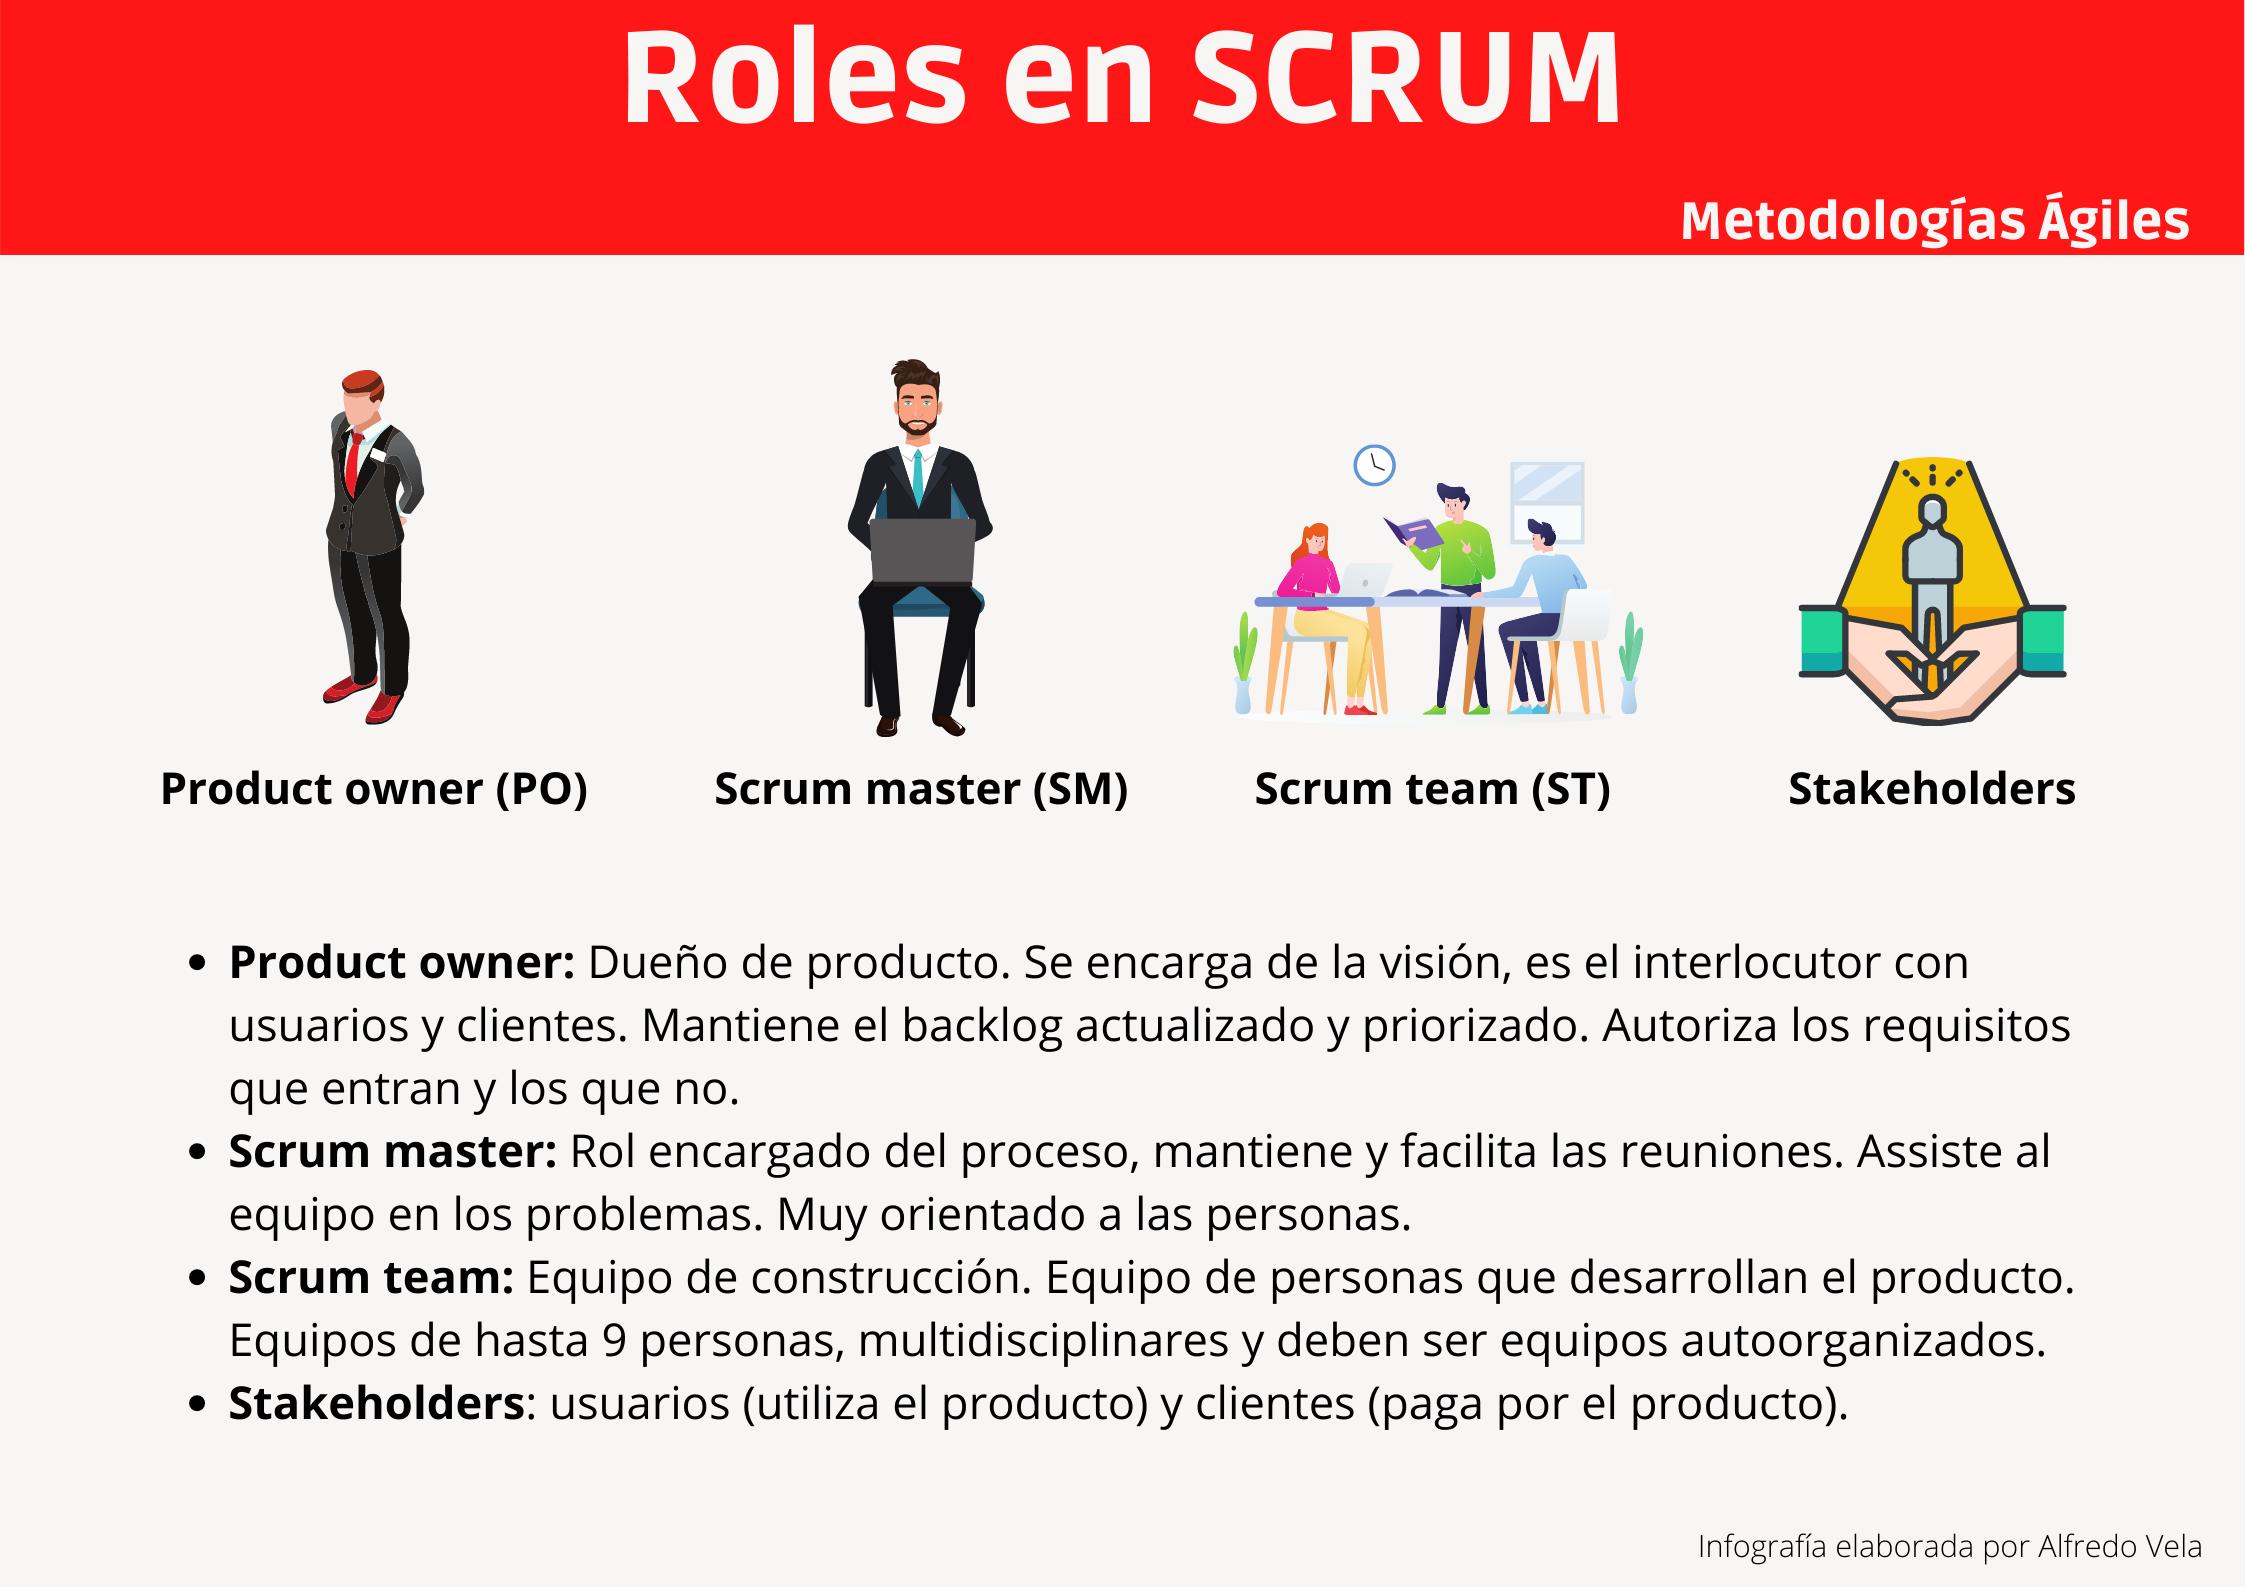 Roles en SCRUM #infografia #infographic #agile